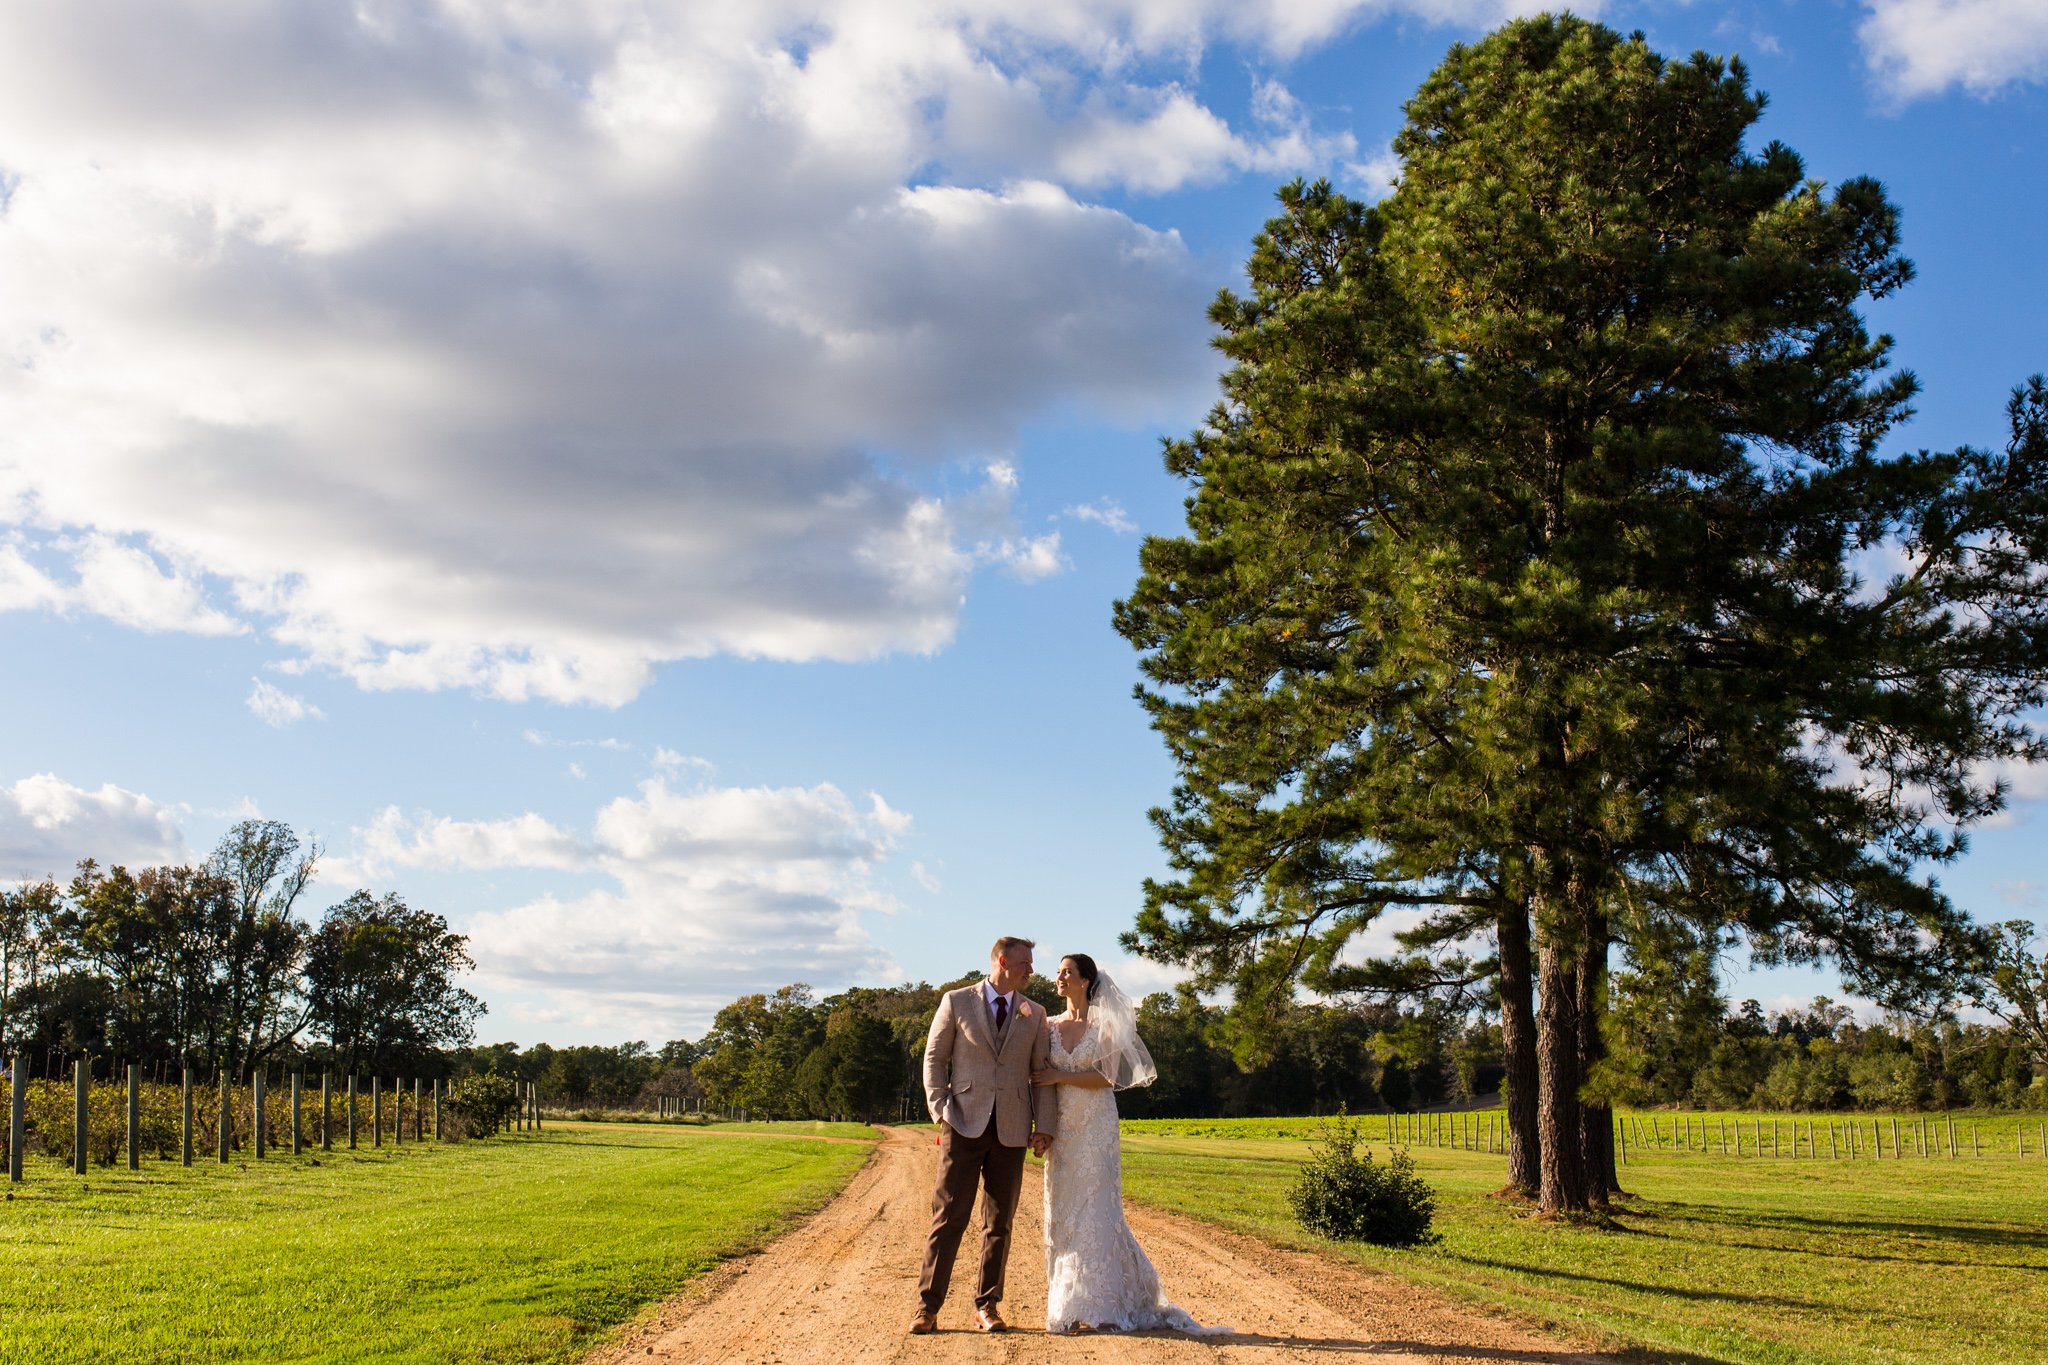 Jubilee+Farm+Wedding+Rob+Jinks+(34).jpg